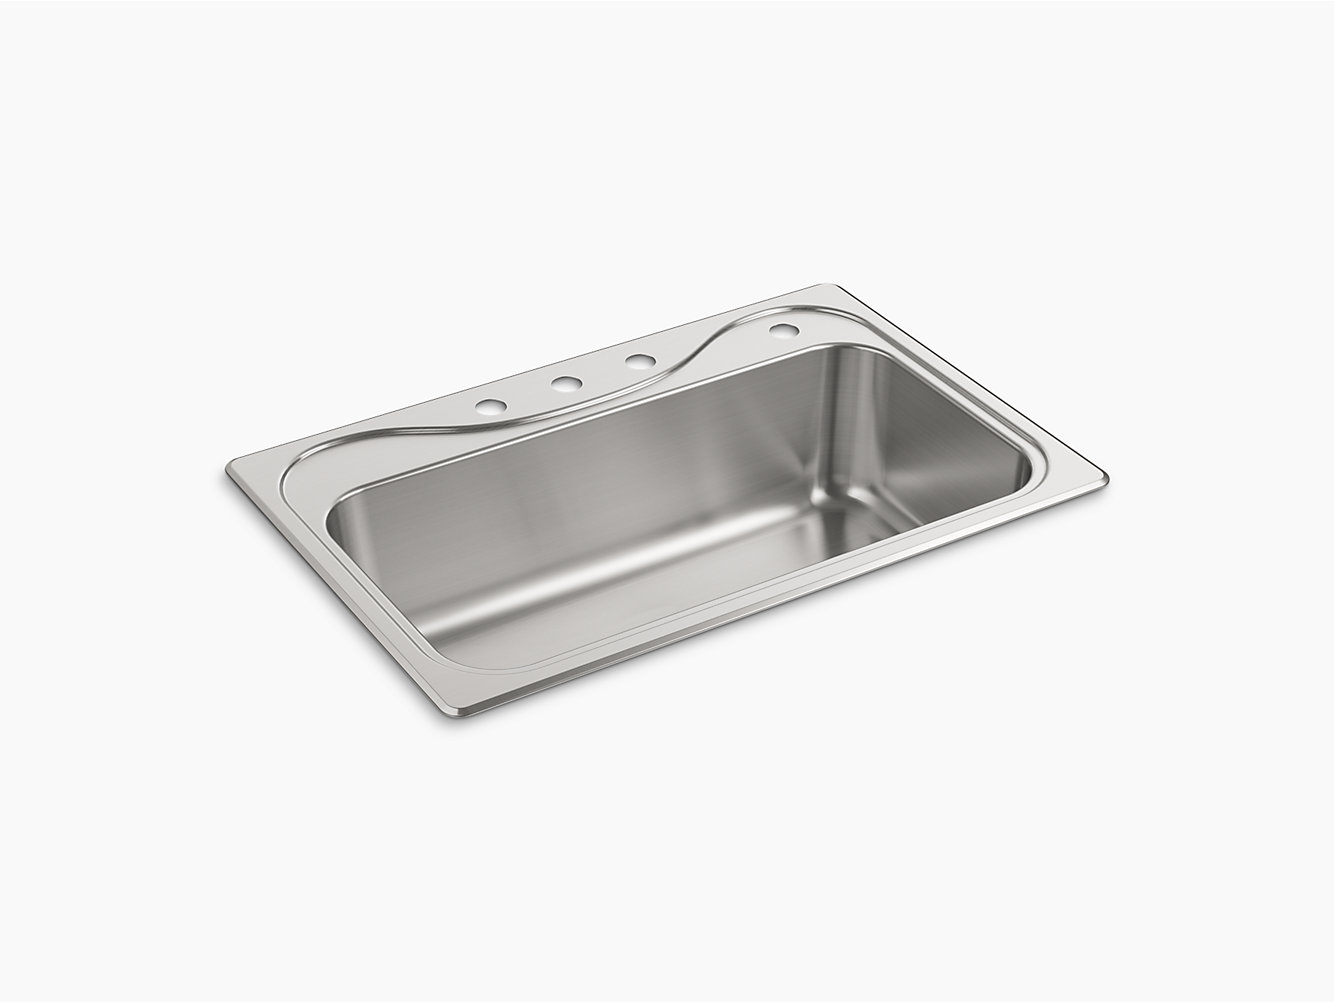 "Southhaven® Top-Mount Single-Bowl Kitchen Sink, 33"" x 22"" x 9-1/4"" | 37047-4-NA | STERLING"